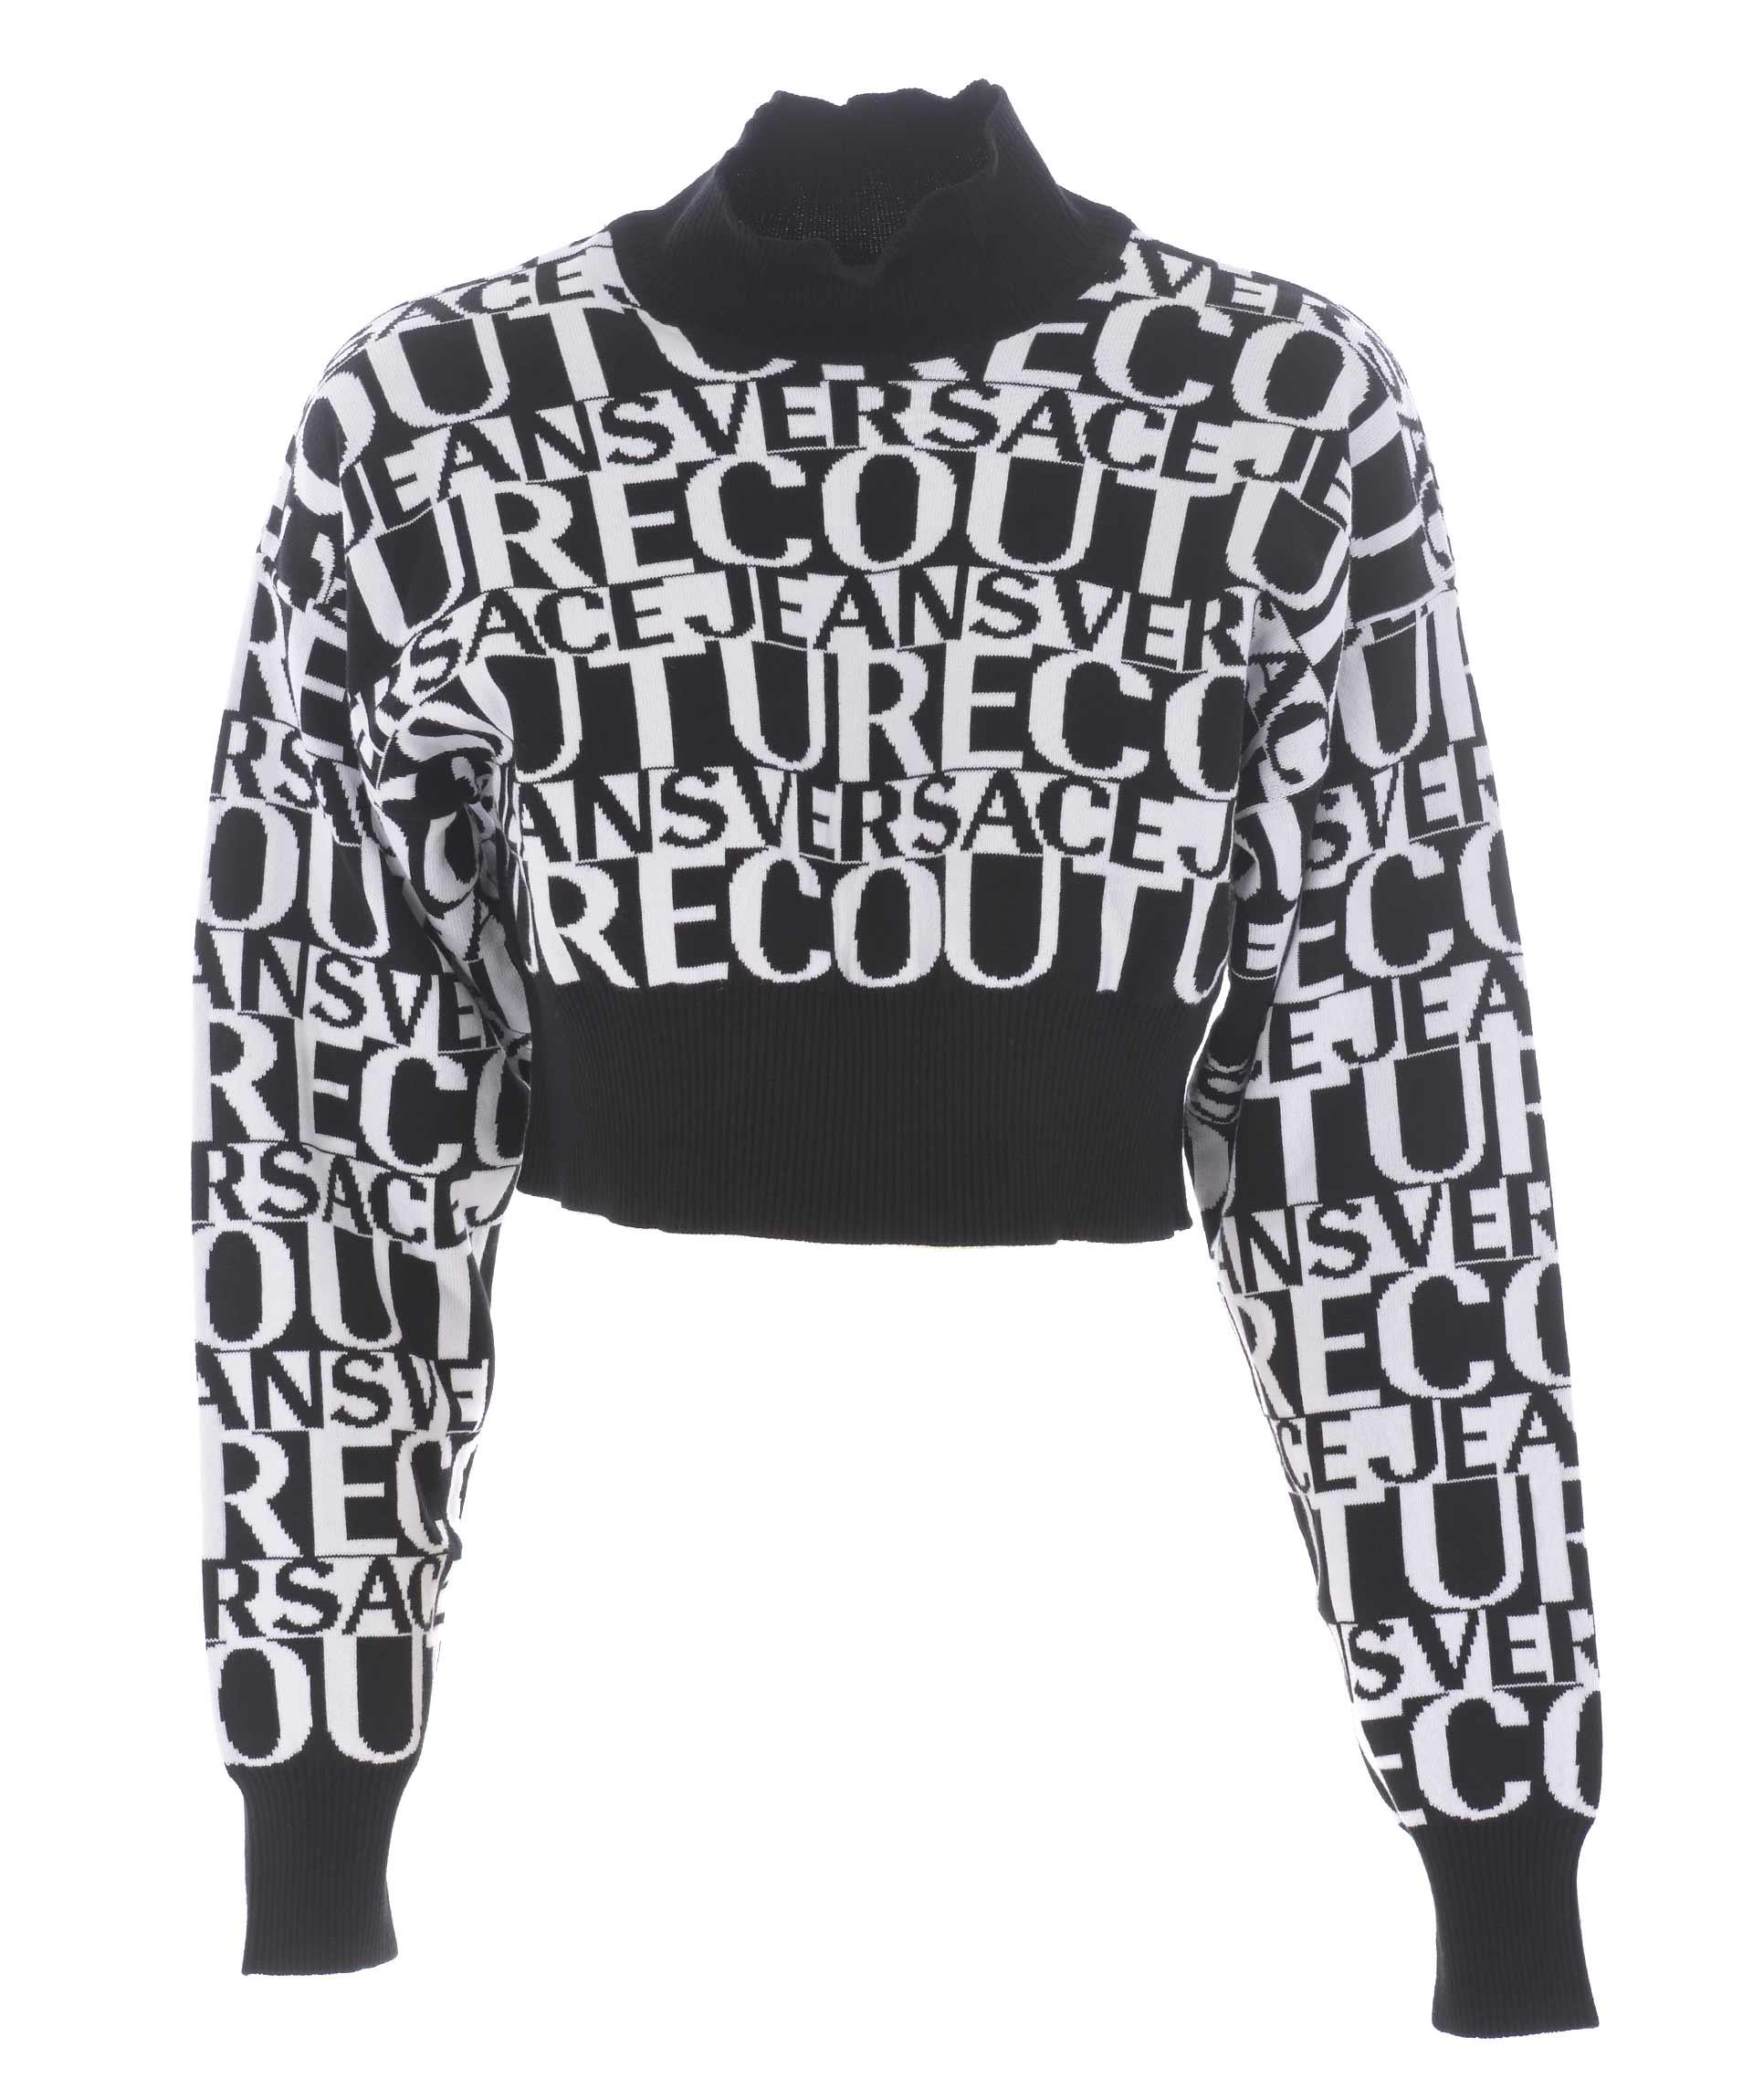 prezzo competitivo 1d9fd 09b8d Maglia crop Versace Jeans Couture